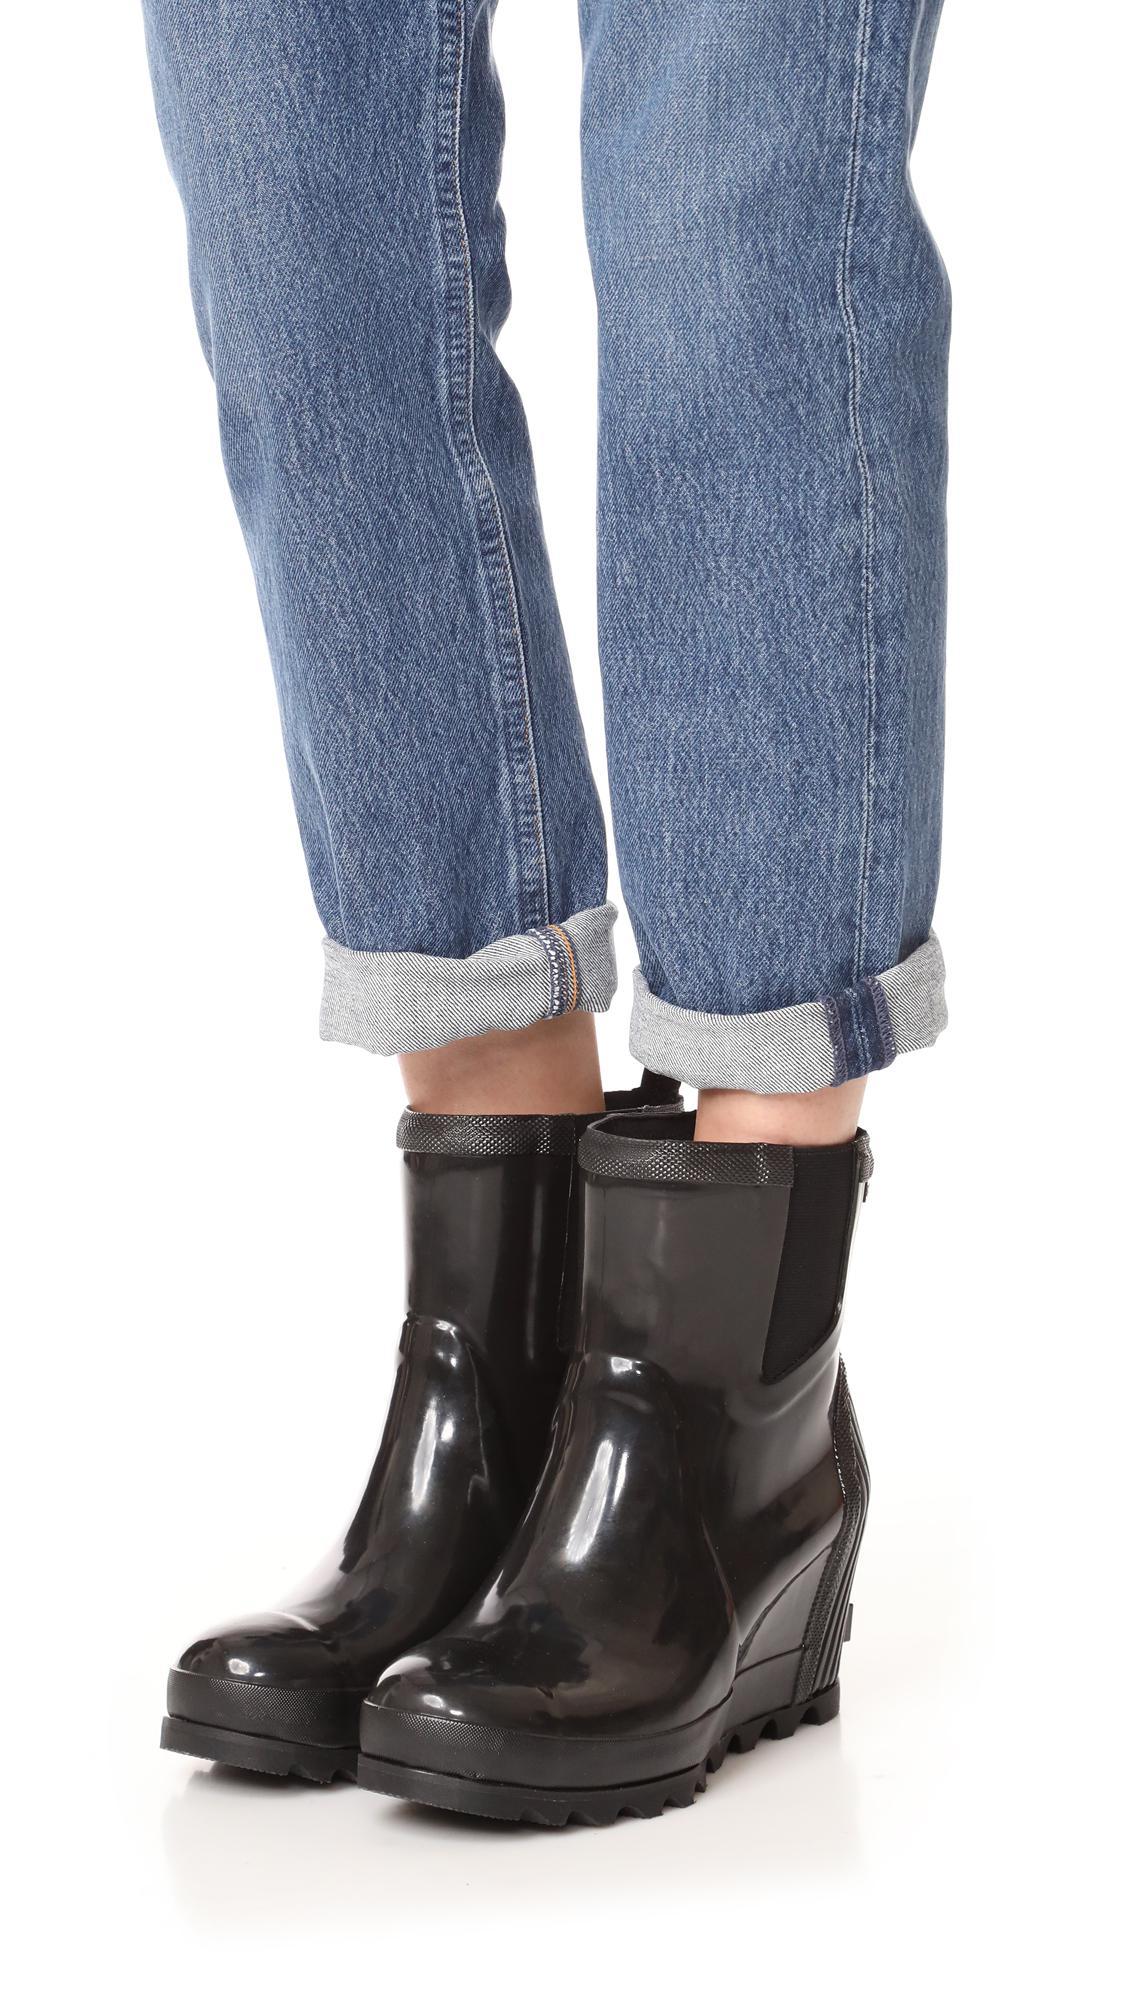 e366444bd735 Lyst - Sorel Joan Rain Wedge Chelsea Gloss Rain Booties in Black